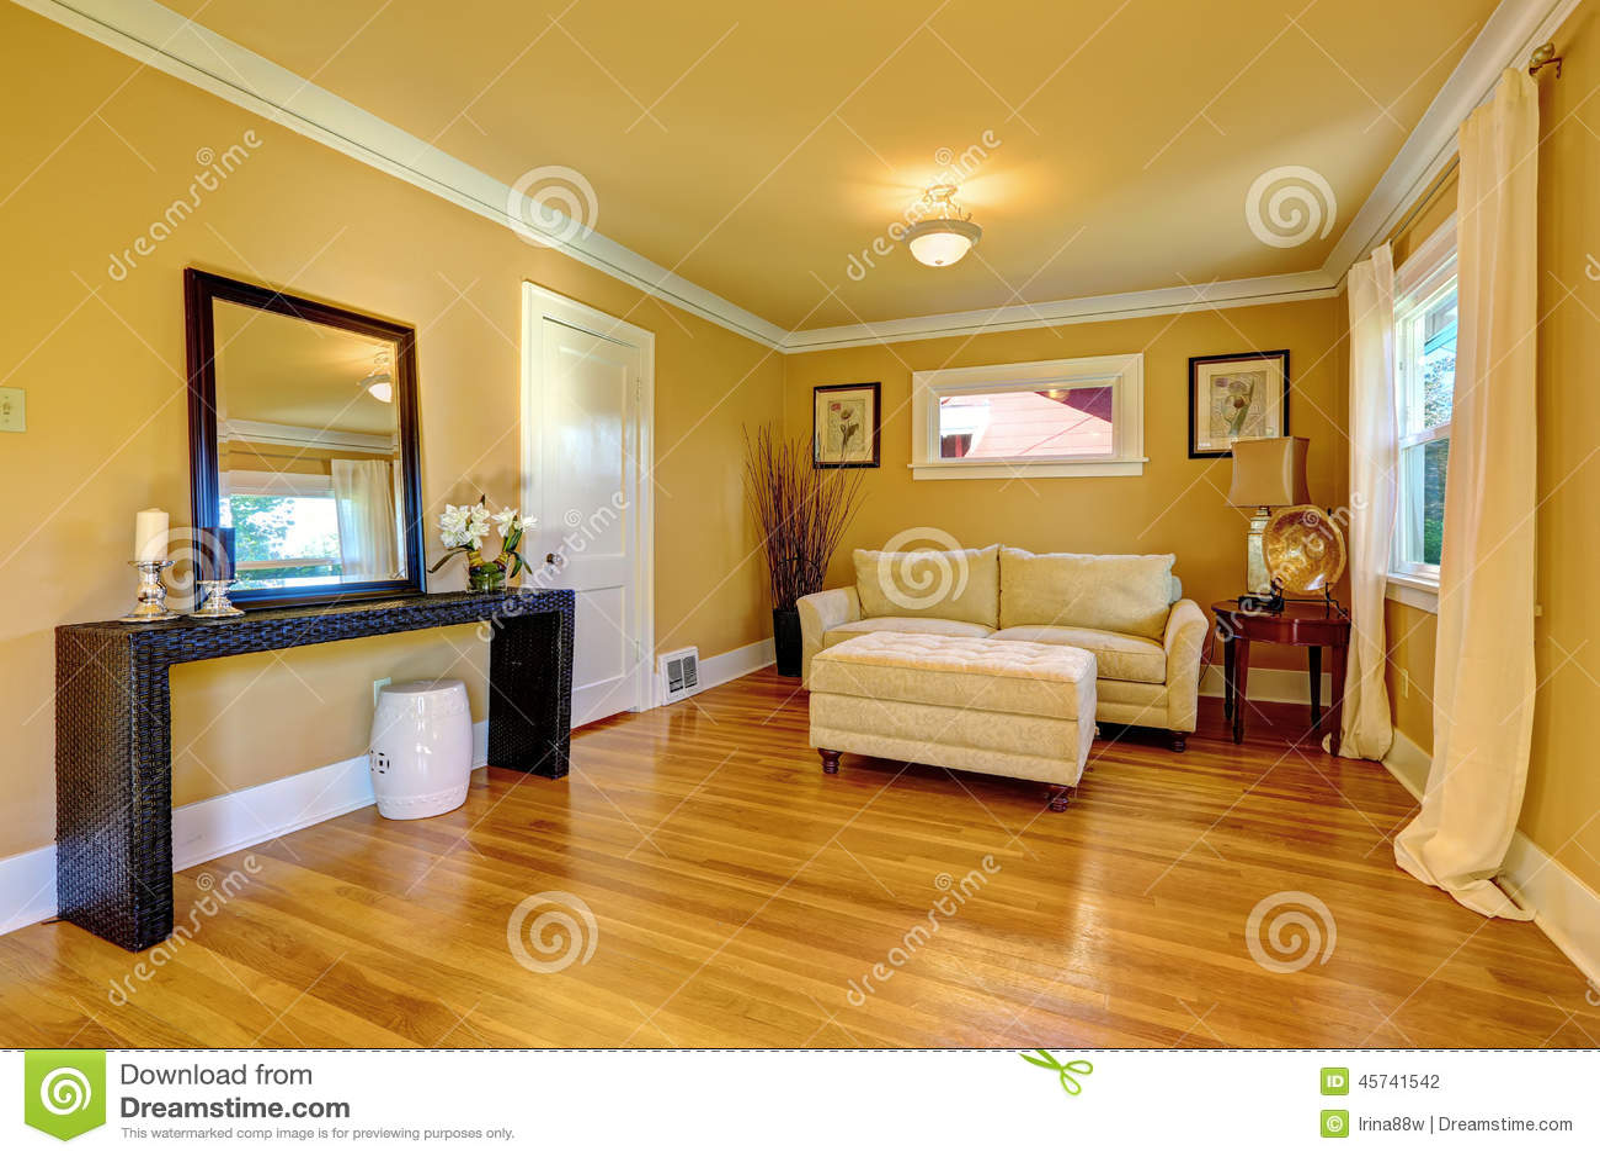 Cozy sitting area family room interior stock photo image 45741542 - Interior sitting rooms ...